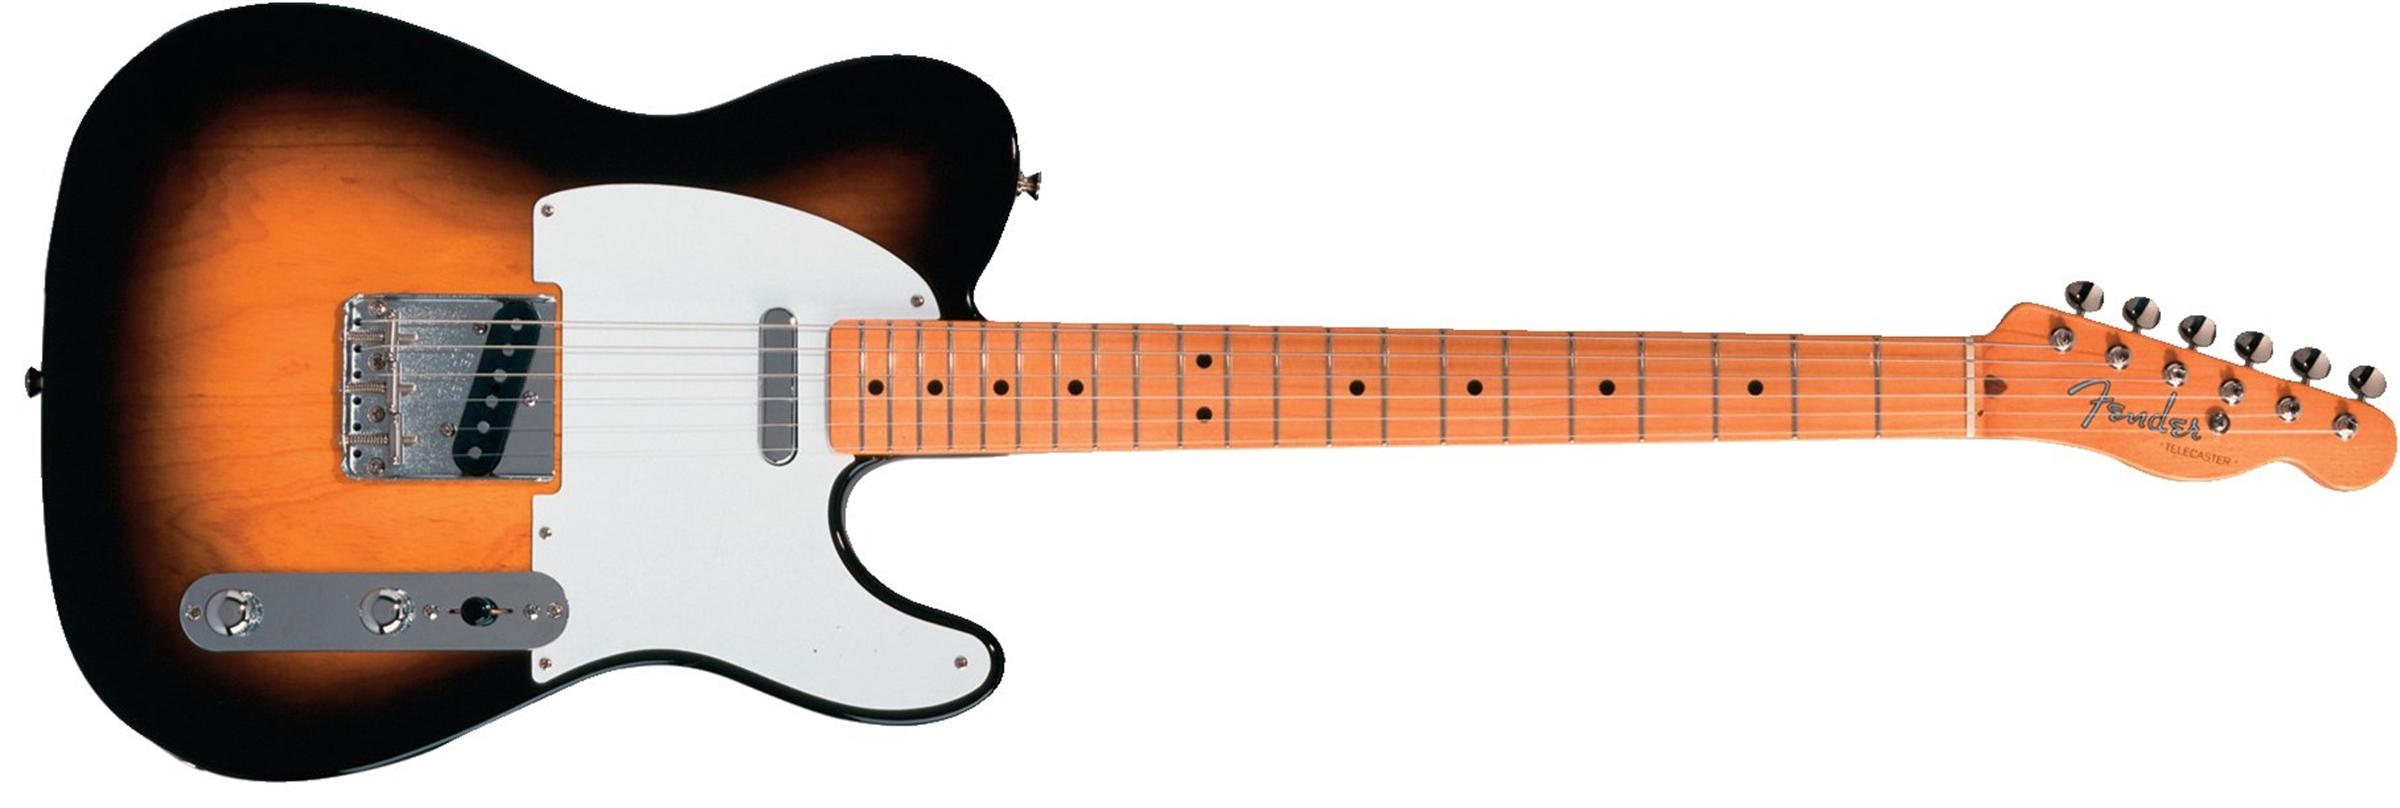 Fender Classic Series '50s Telecaster® 2-Color Sunburst Maple Fingerboard Electric Guitar